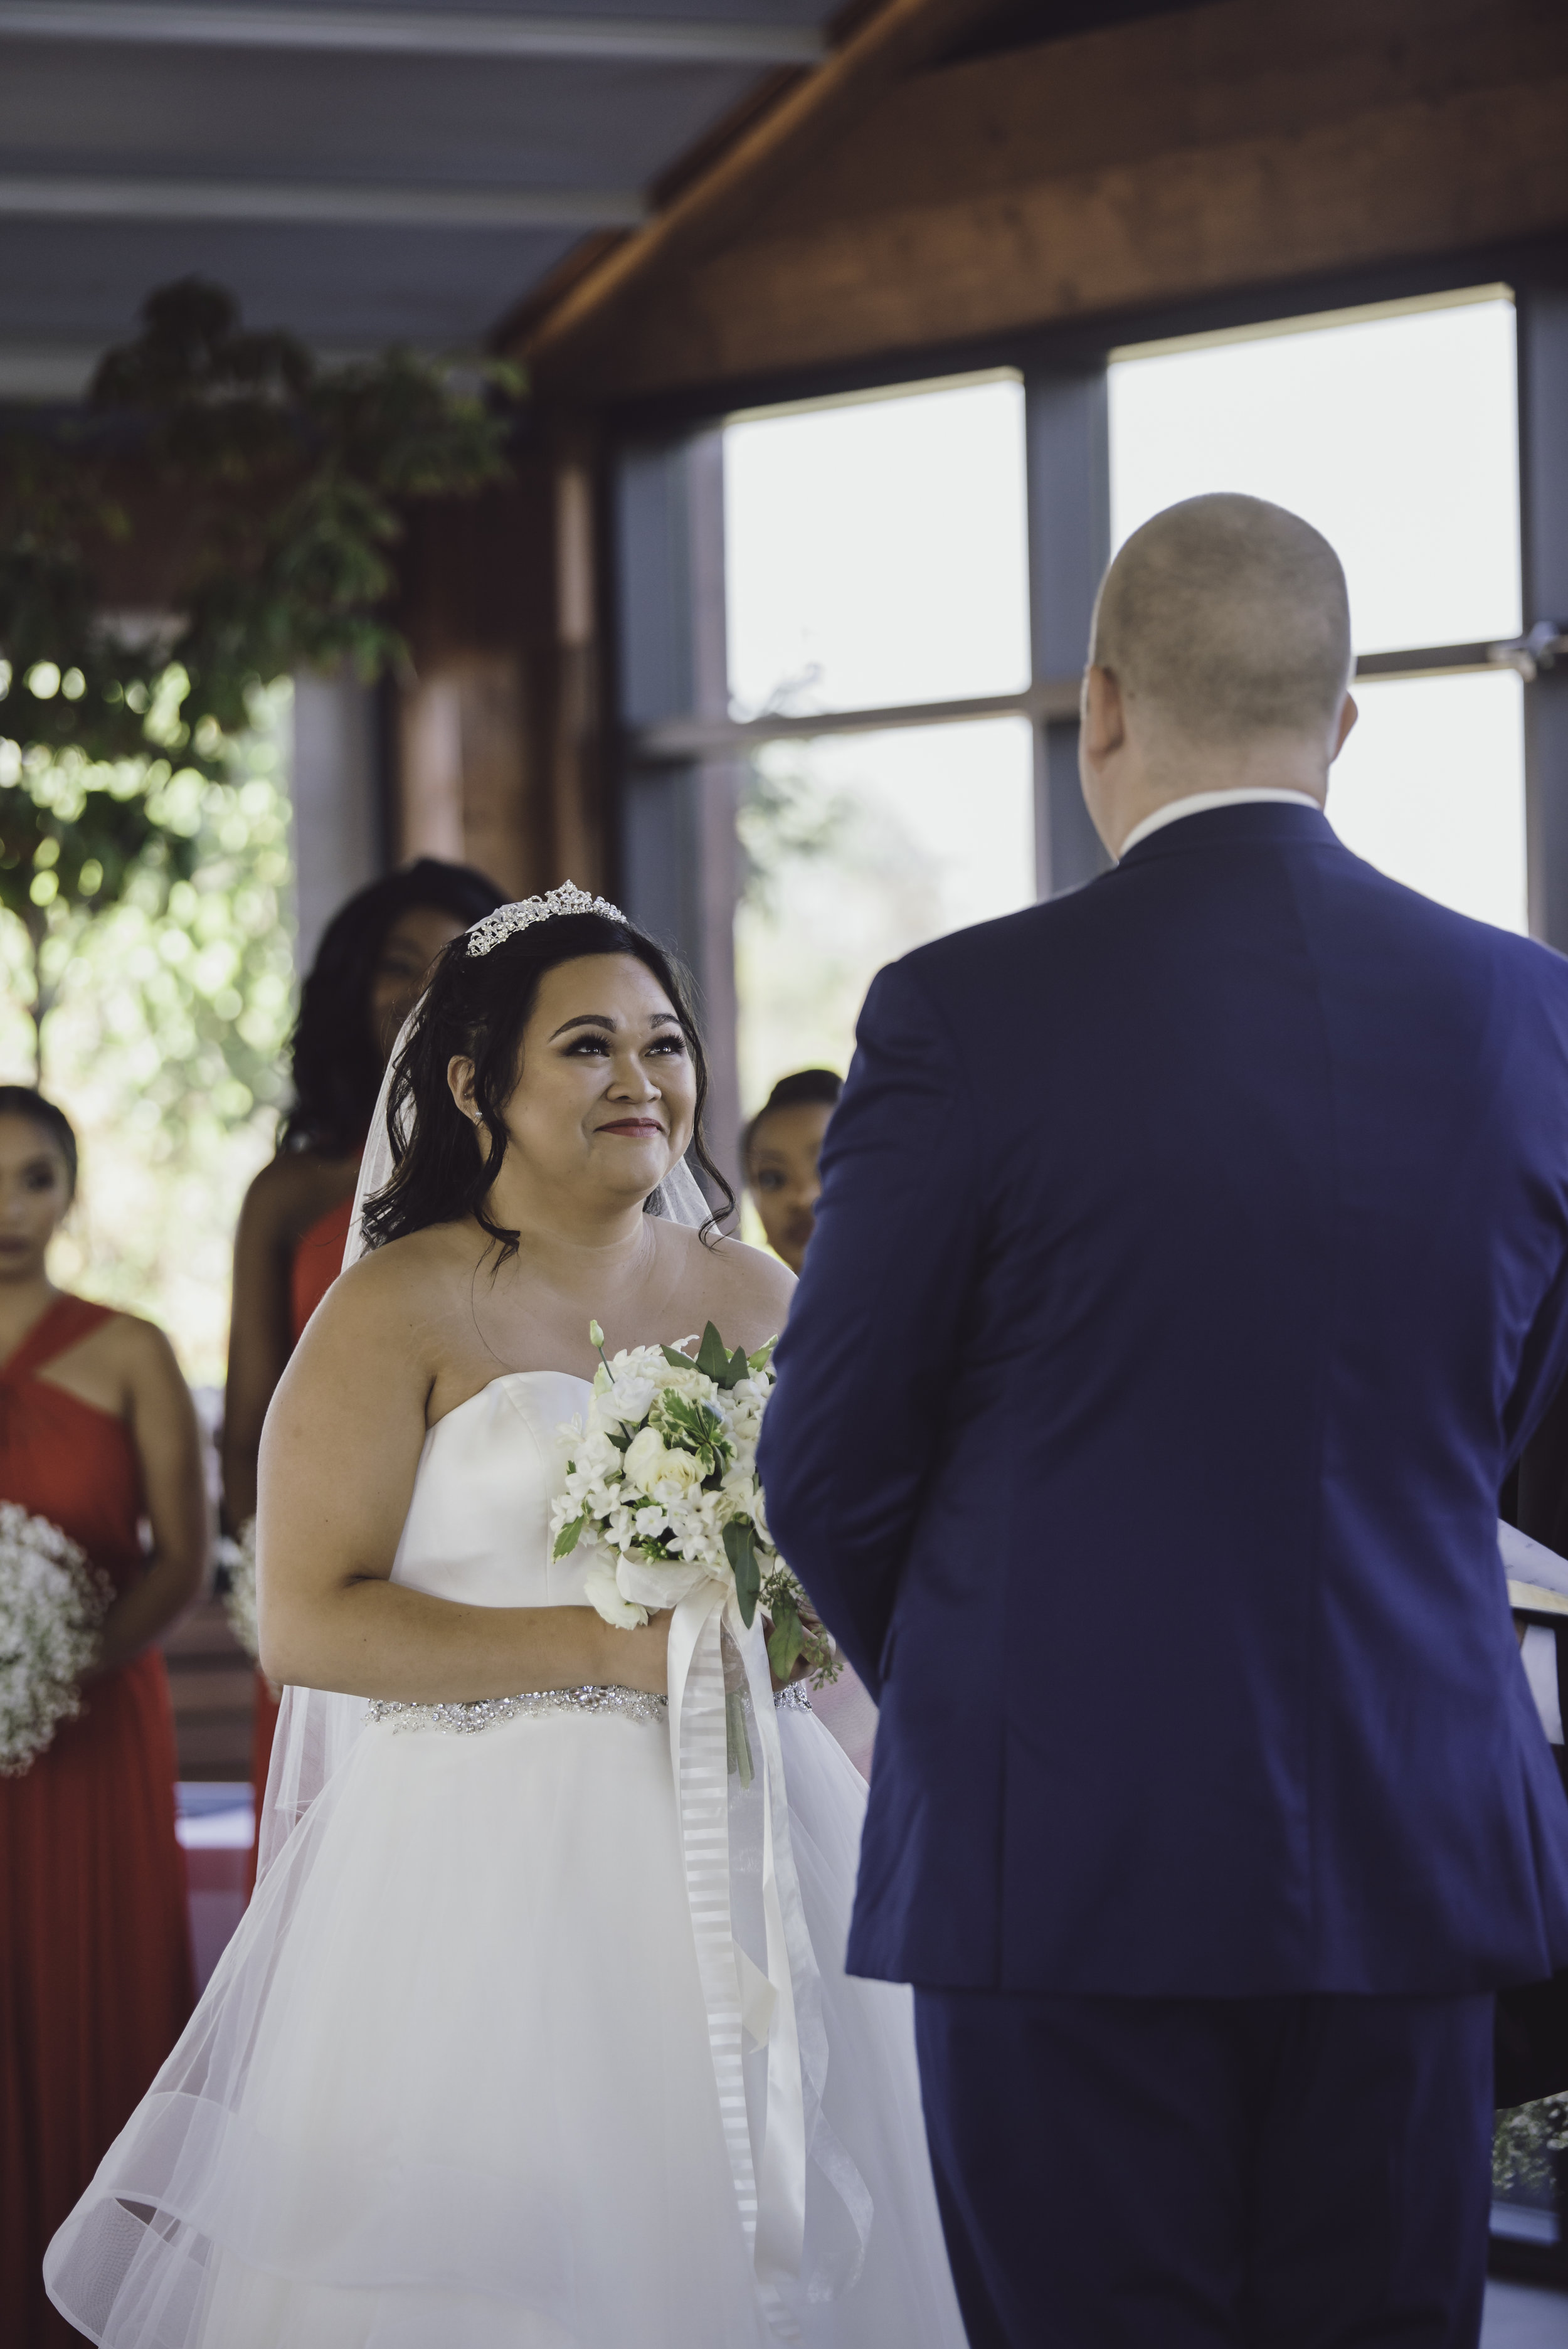 Will&Steph wedding -348.jpg